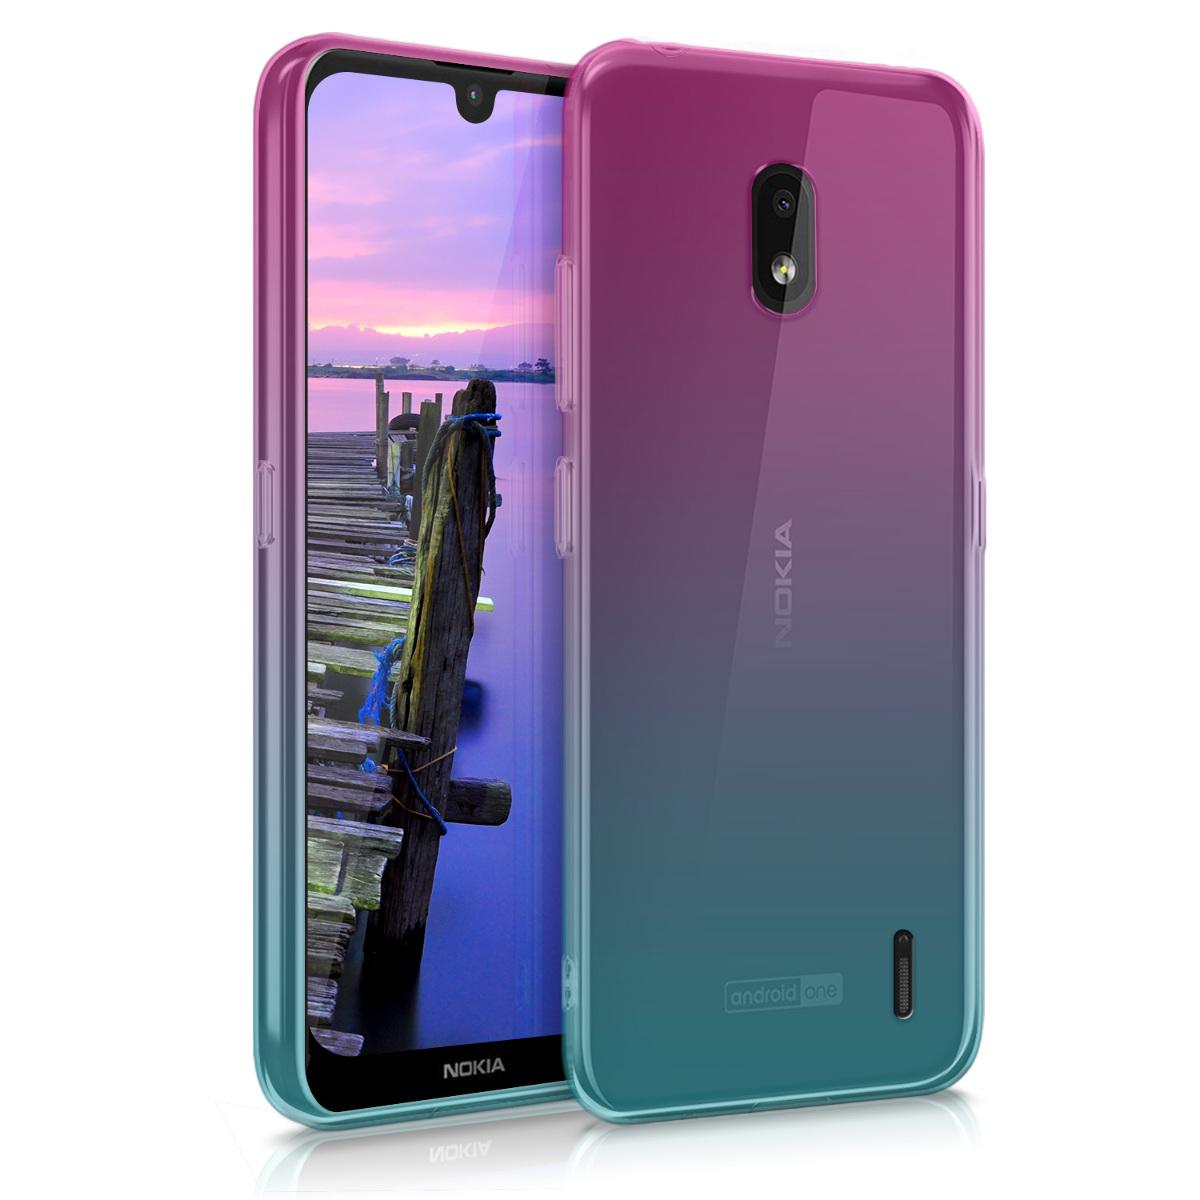 KW Θήκη Σιλικόνης Nokia 2.2 - Clear TPU Soft Phone Cover - Dark Pink / Blue / Transparent (49635.01)